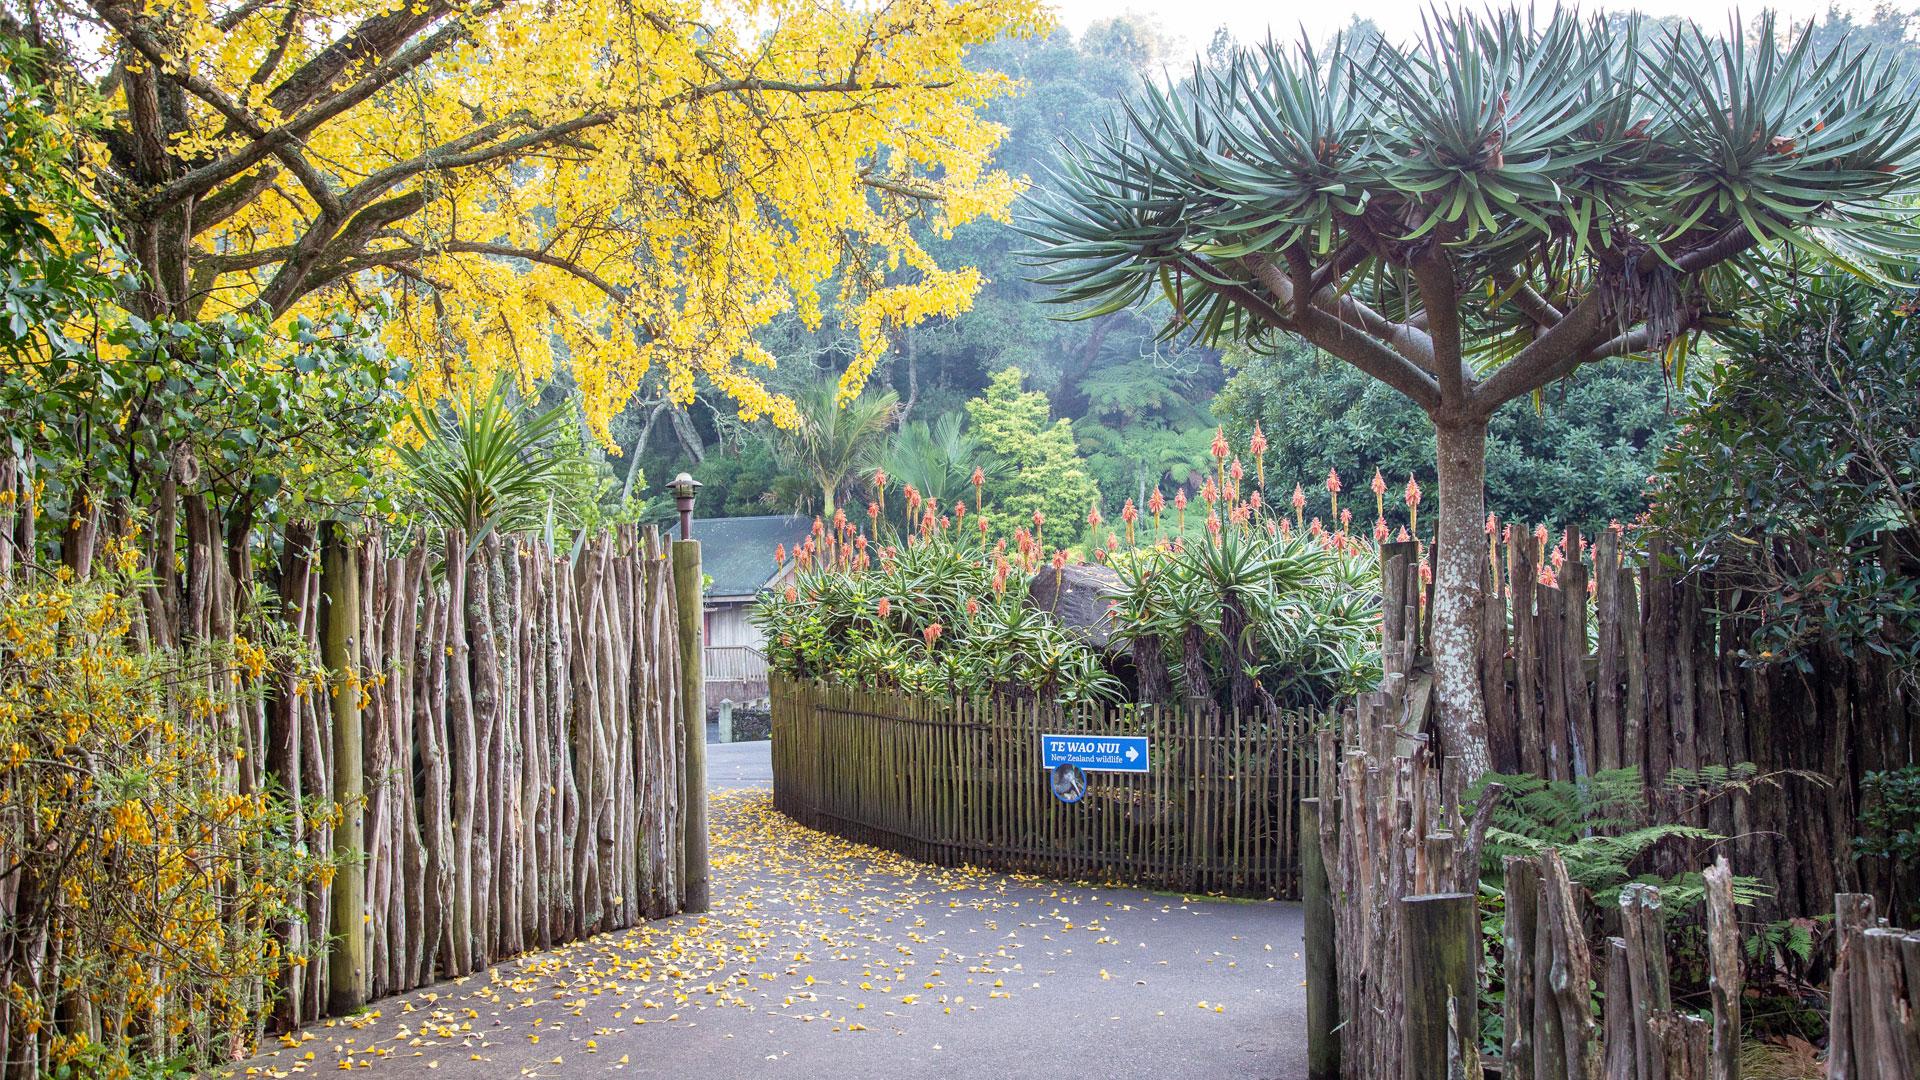 https://rfacdn.nz/zoo/assets/media/horticulture-blog-aloe-gallery-4.jpg